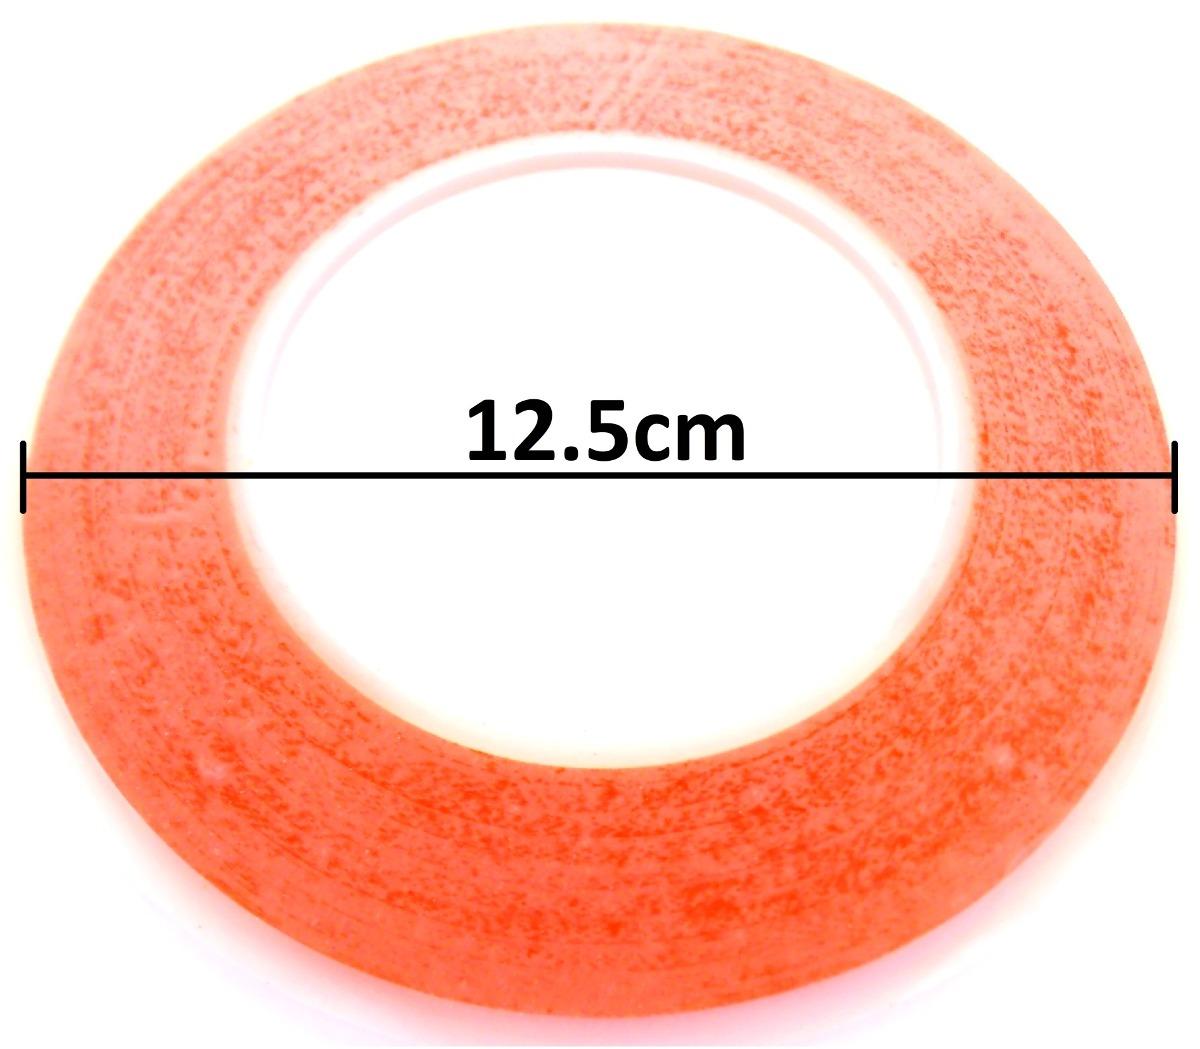 Cinta adhesiva 2mm doble cara transparente 25mts - Cinta adhesiva doble cara transparente ...